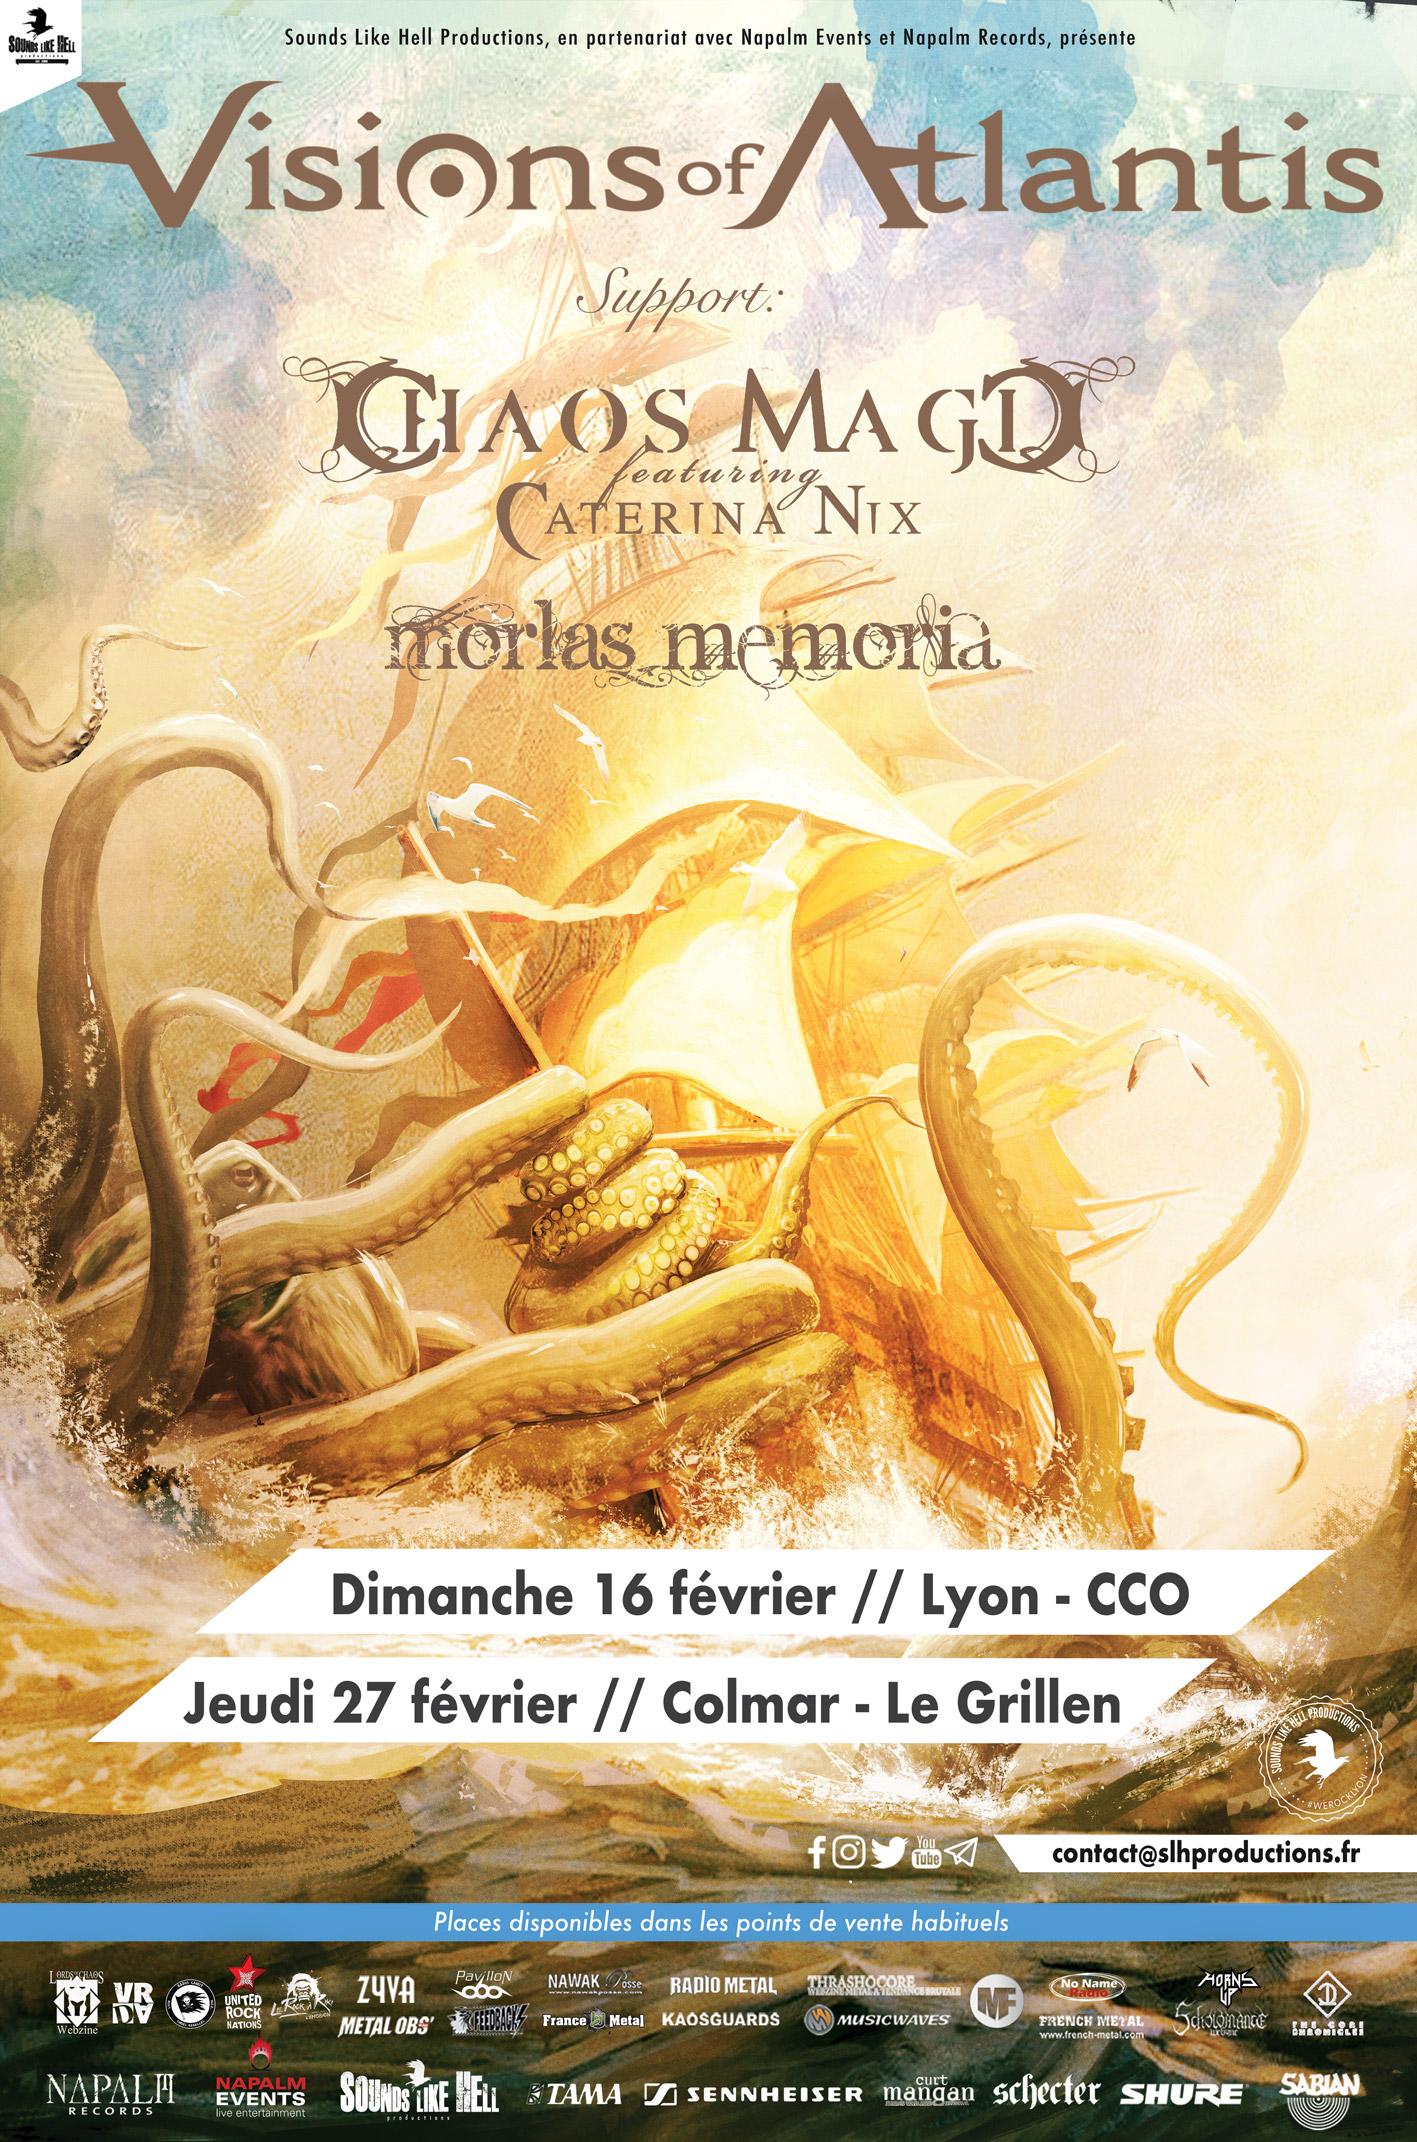 Visions of Atlantis en concert en France